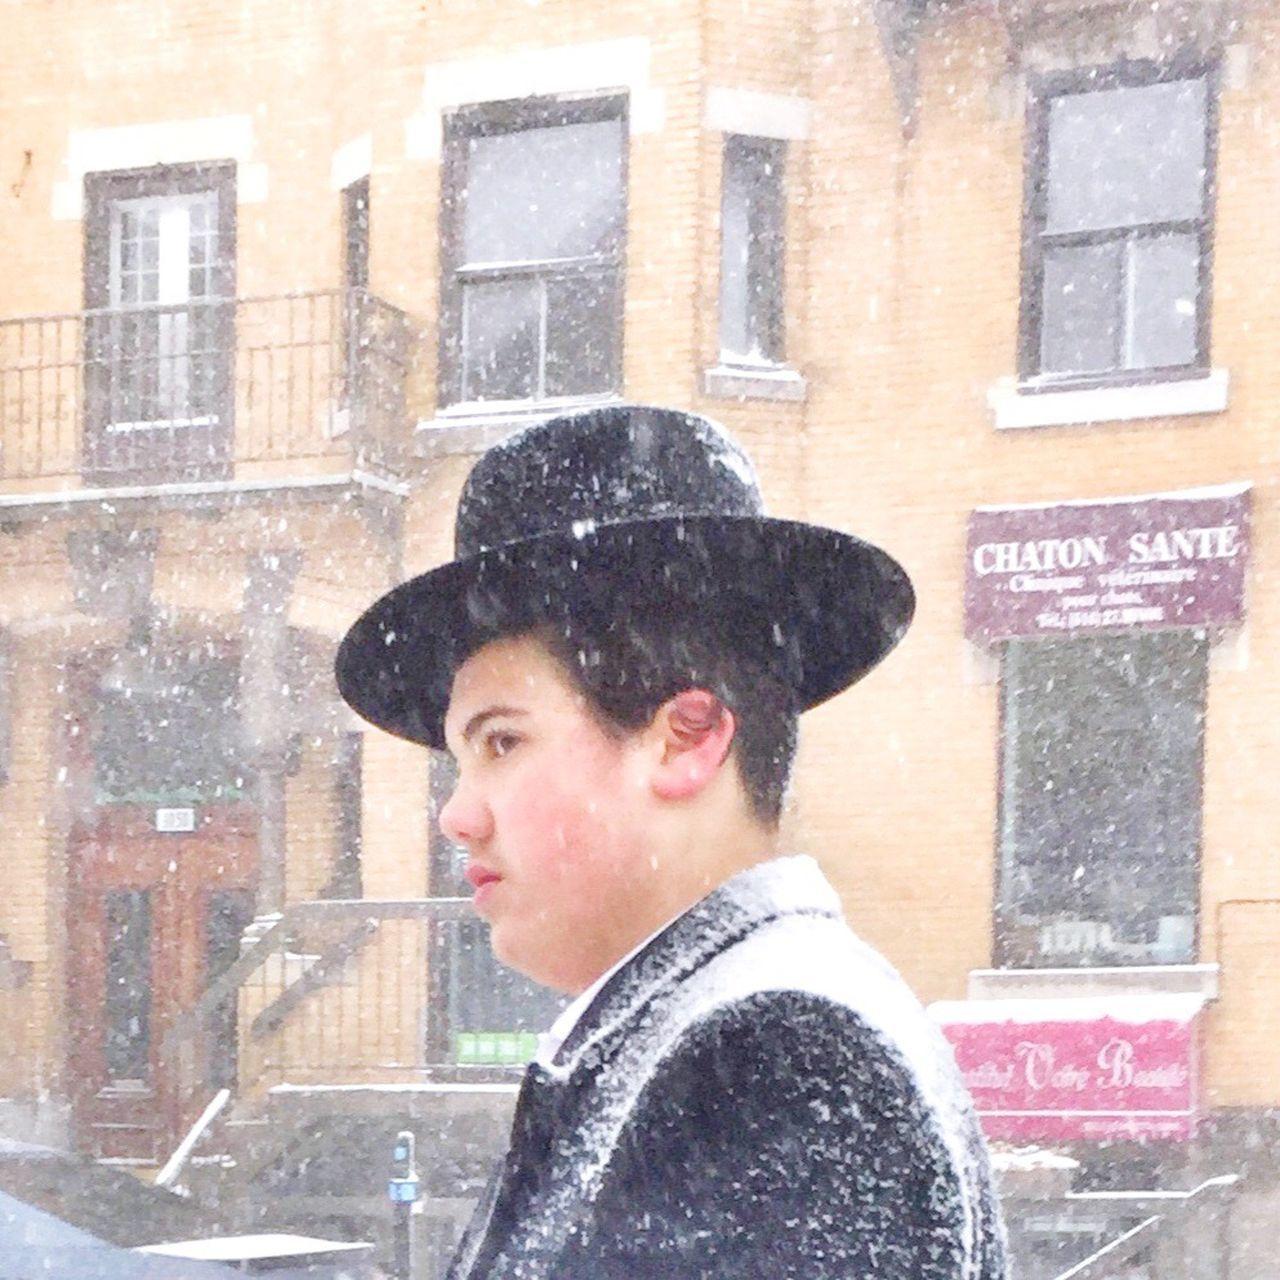 Chaton santé One Person Streetphotography AMPt Community Snow